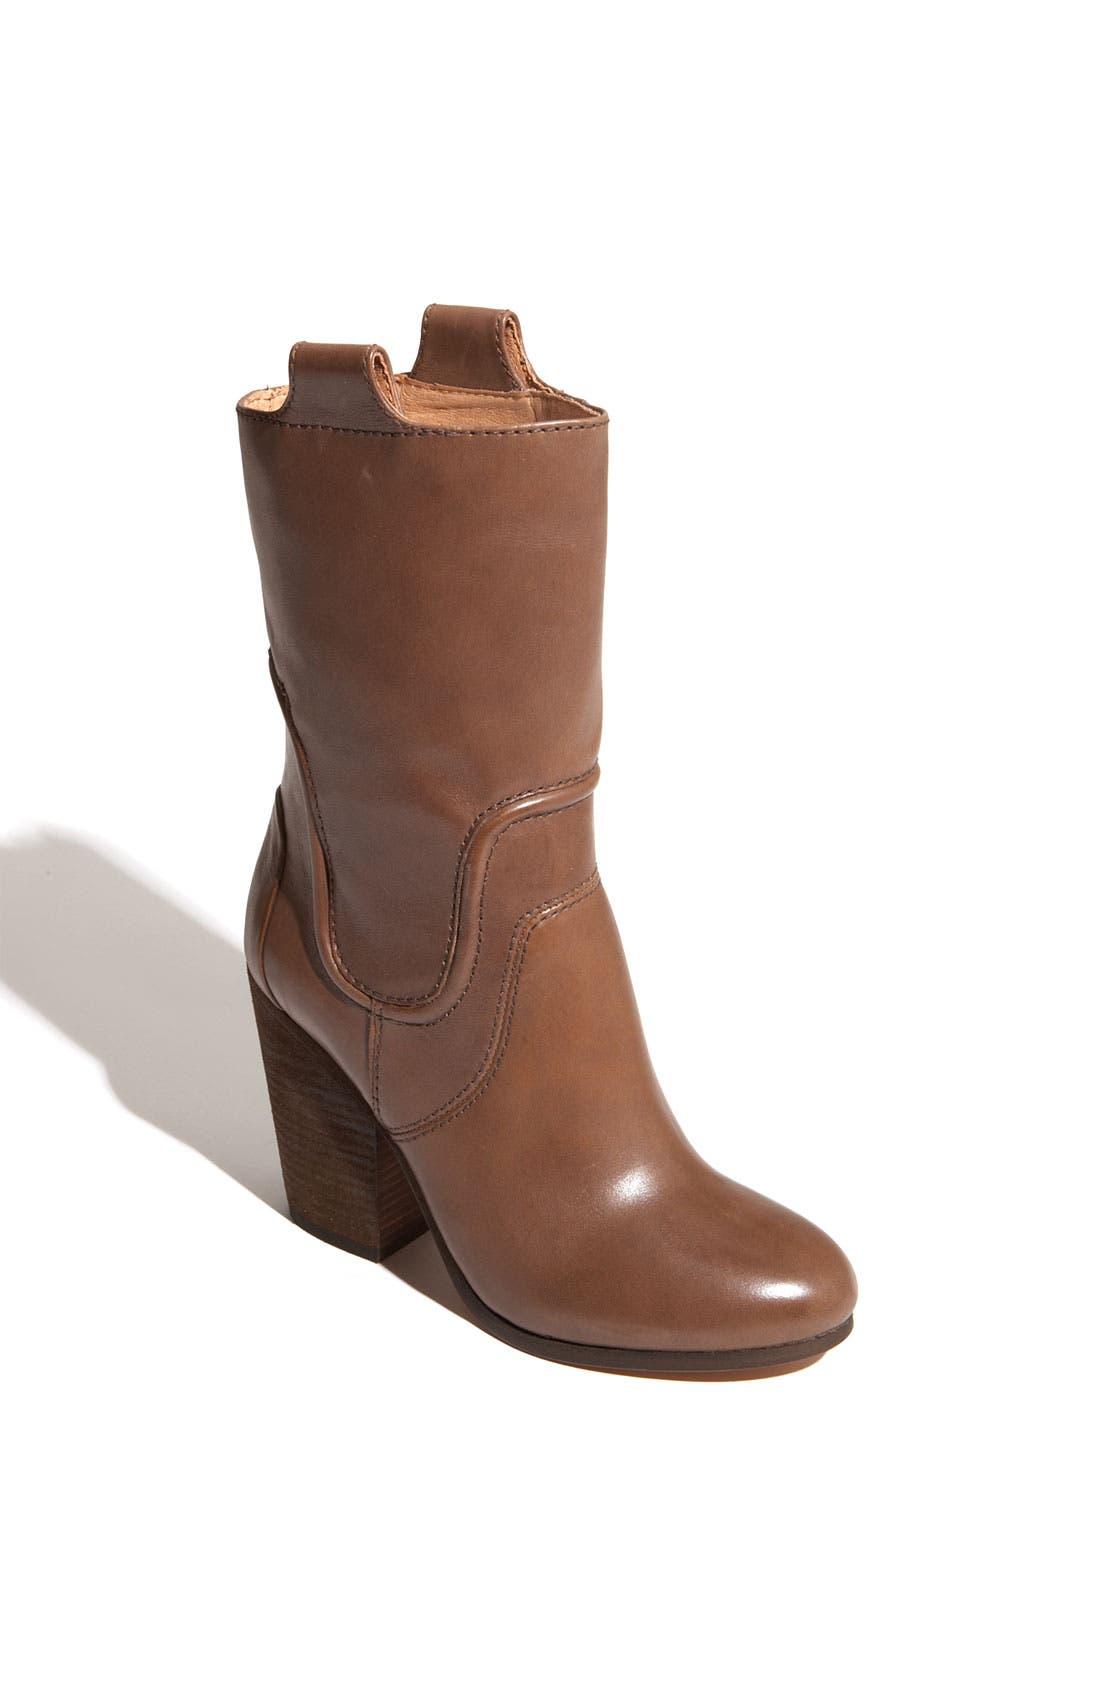 Alternate Image 1 Selected - Modern Vintage 'Theo' Boot